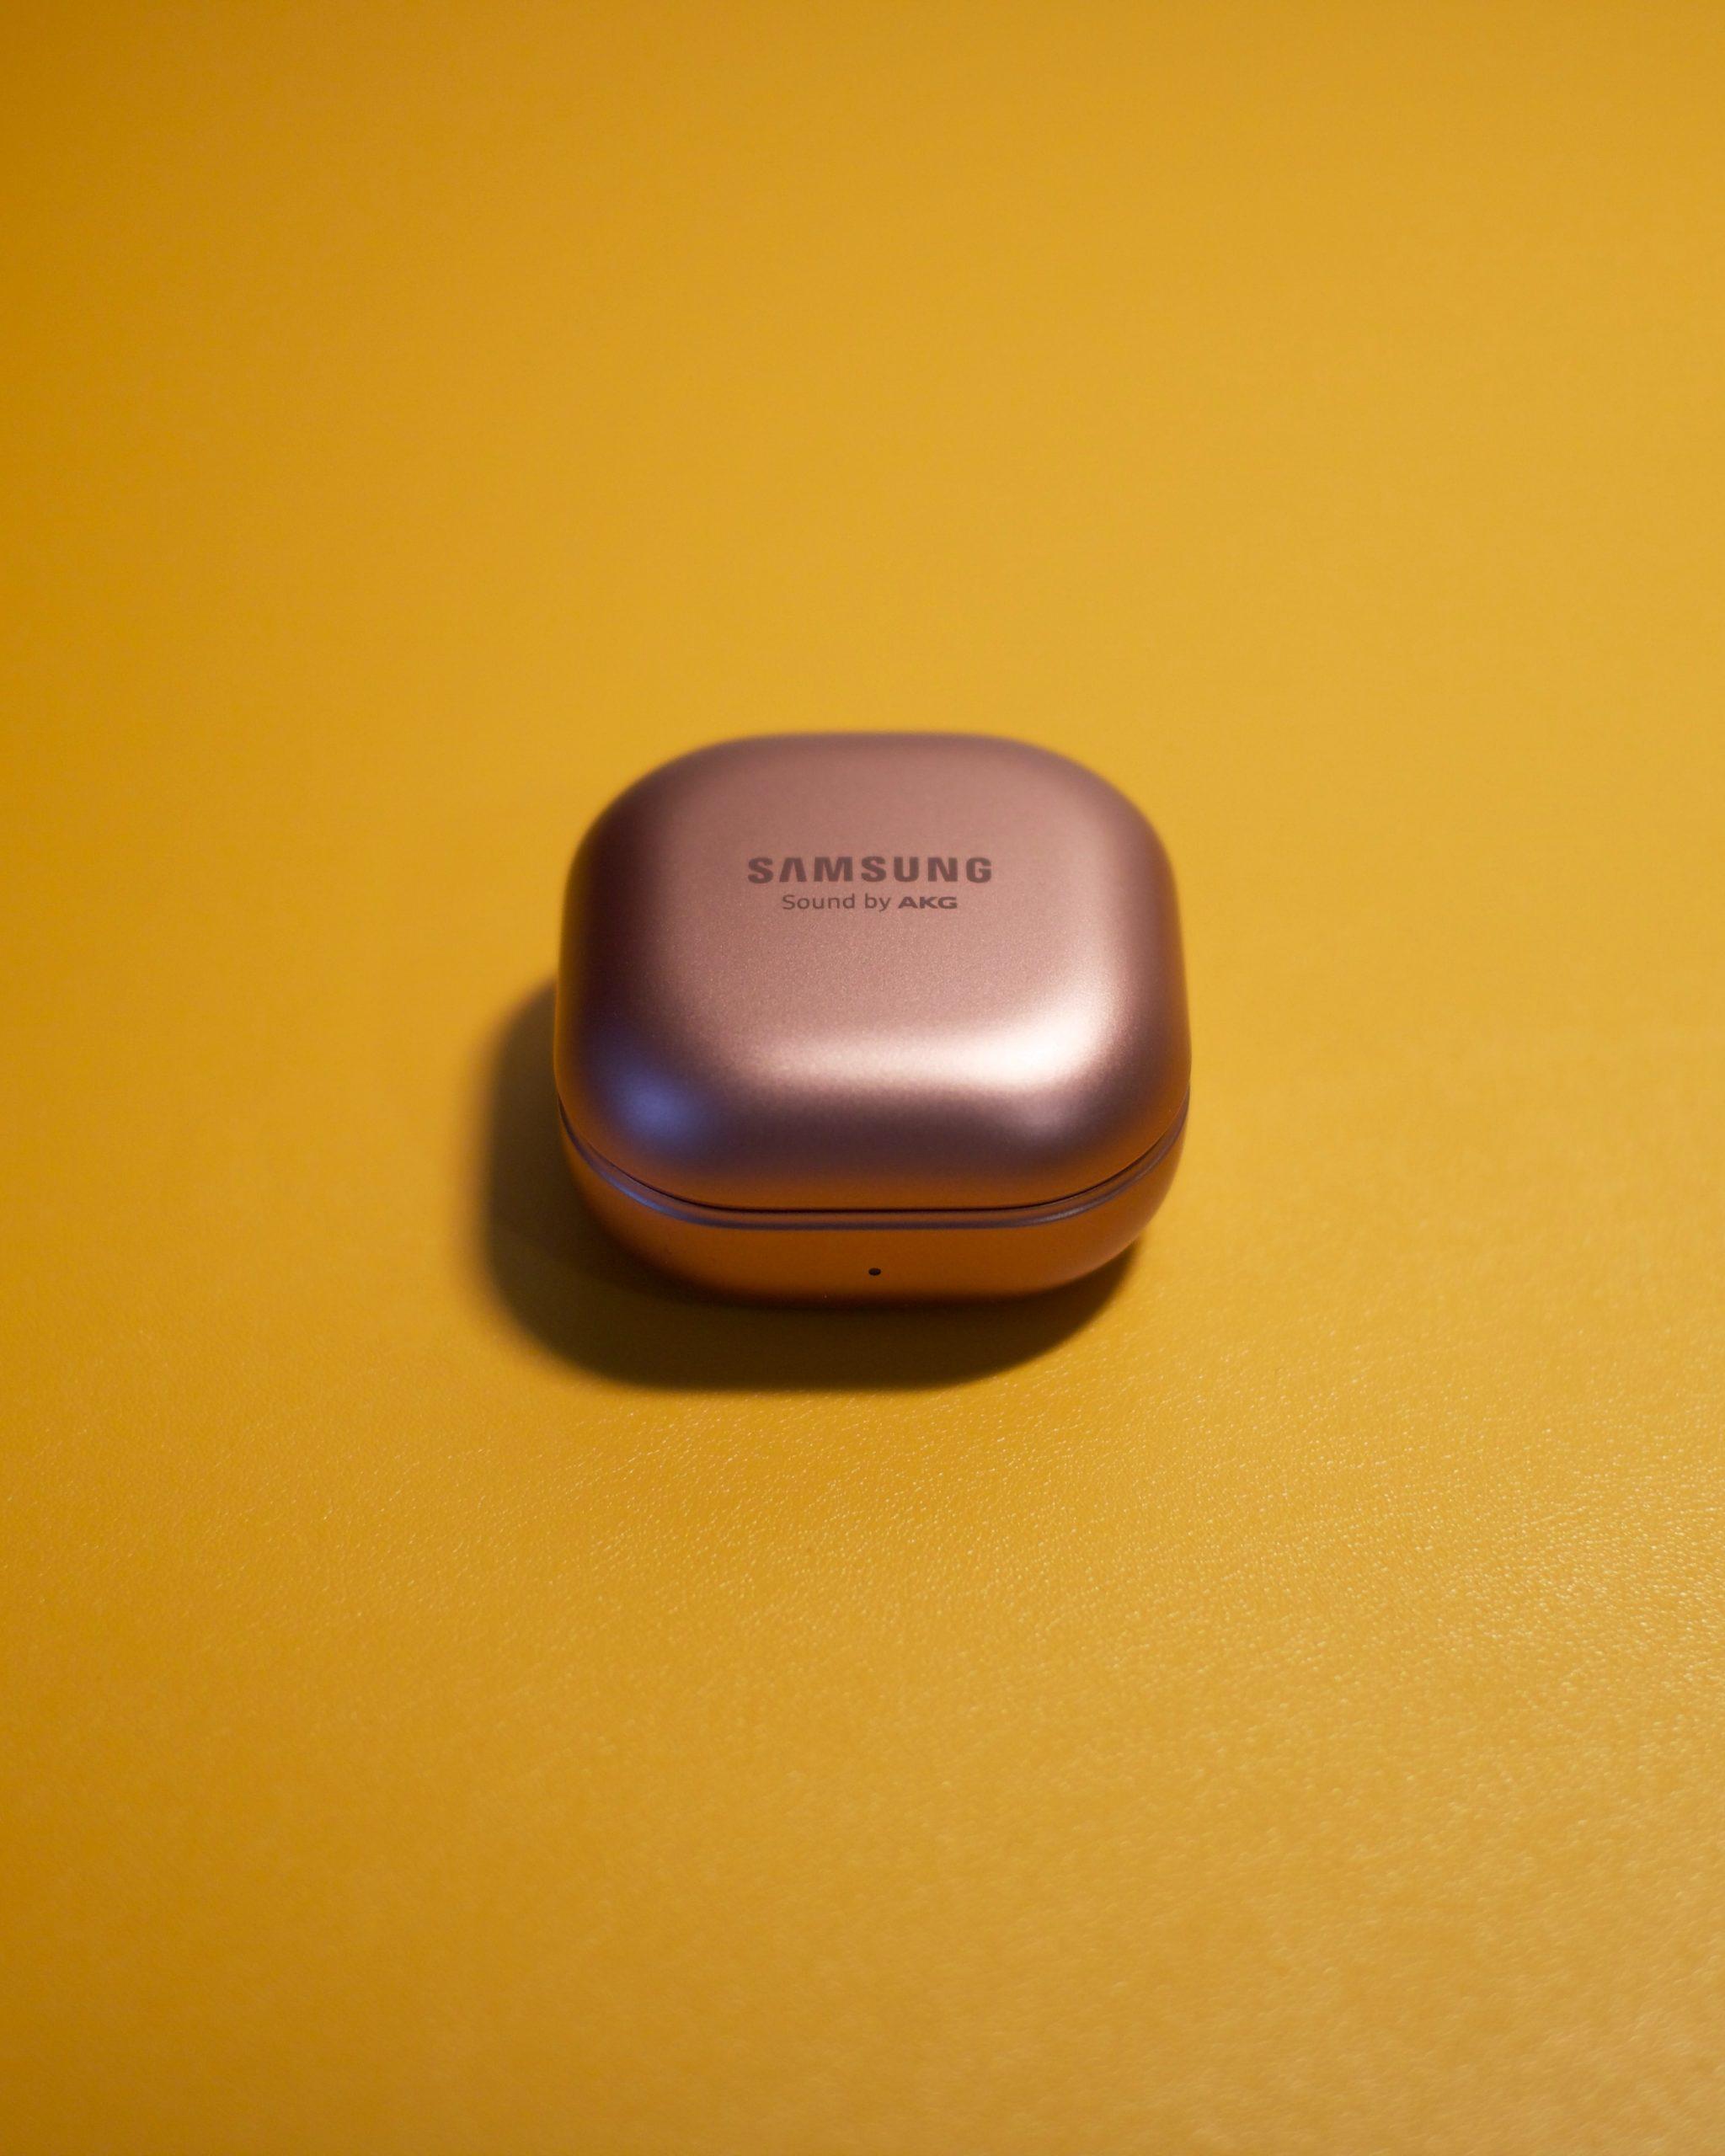 Samsung Unveiled Its Galaxy F52 5G Smartphone